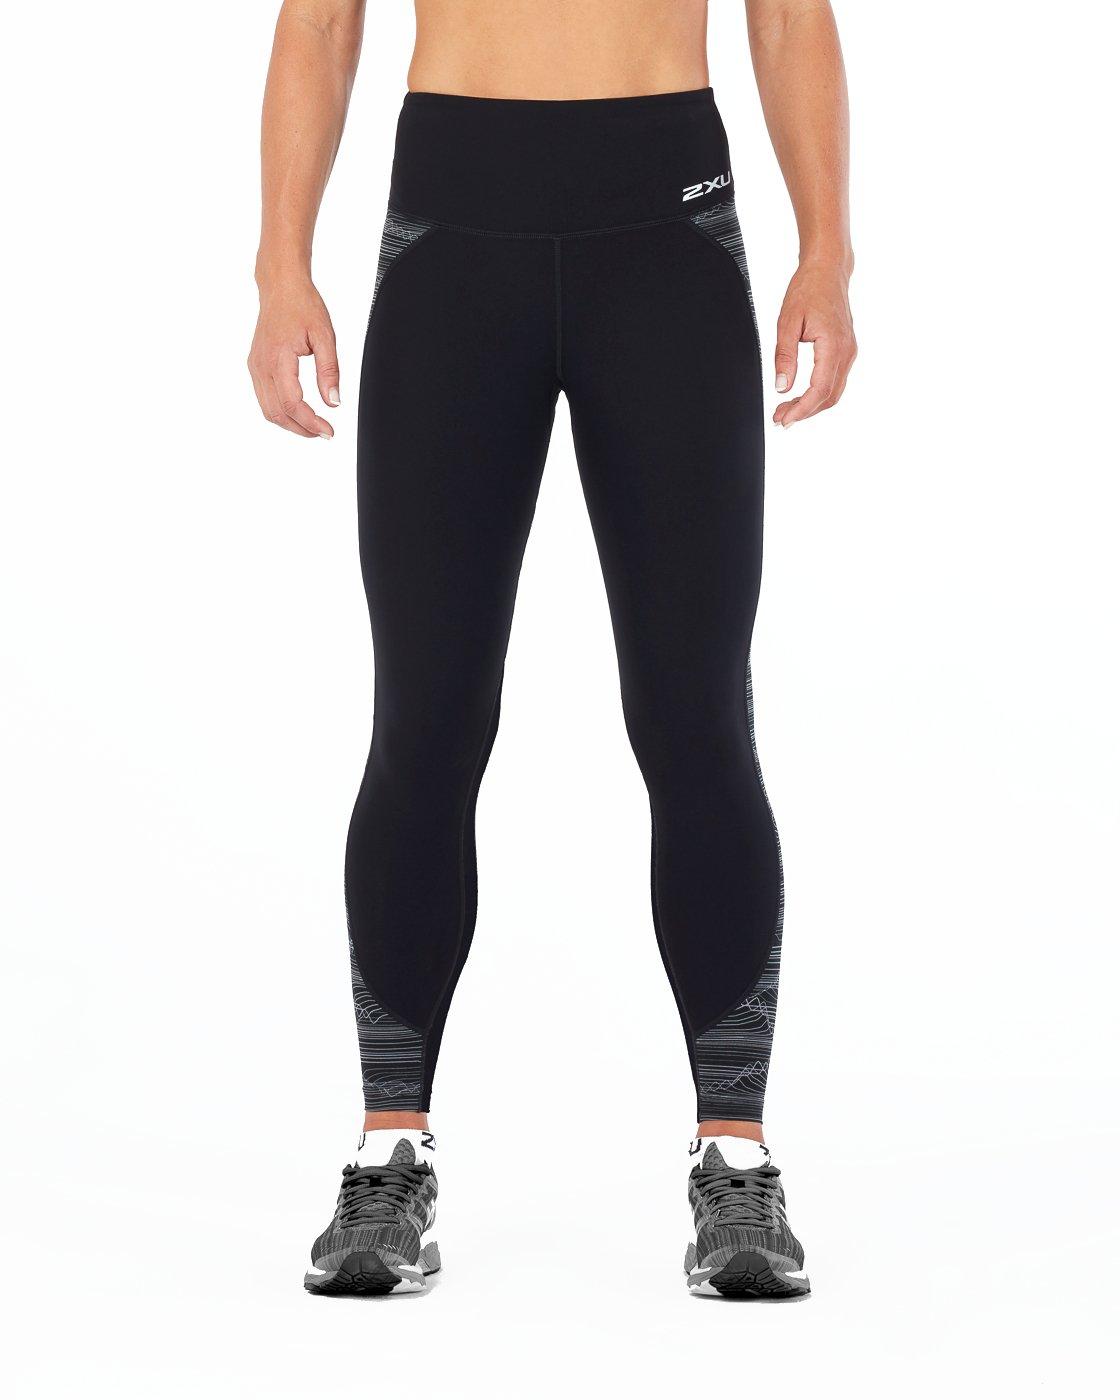 232c74714a Amazon.com : 2XU Women's Fitness Hi-Rise Compression Tights : Clothing